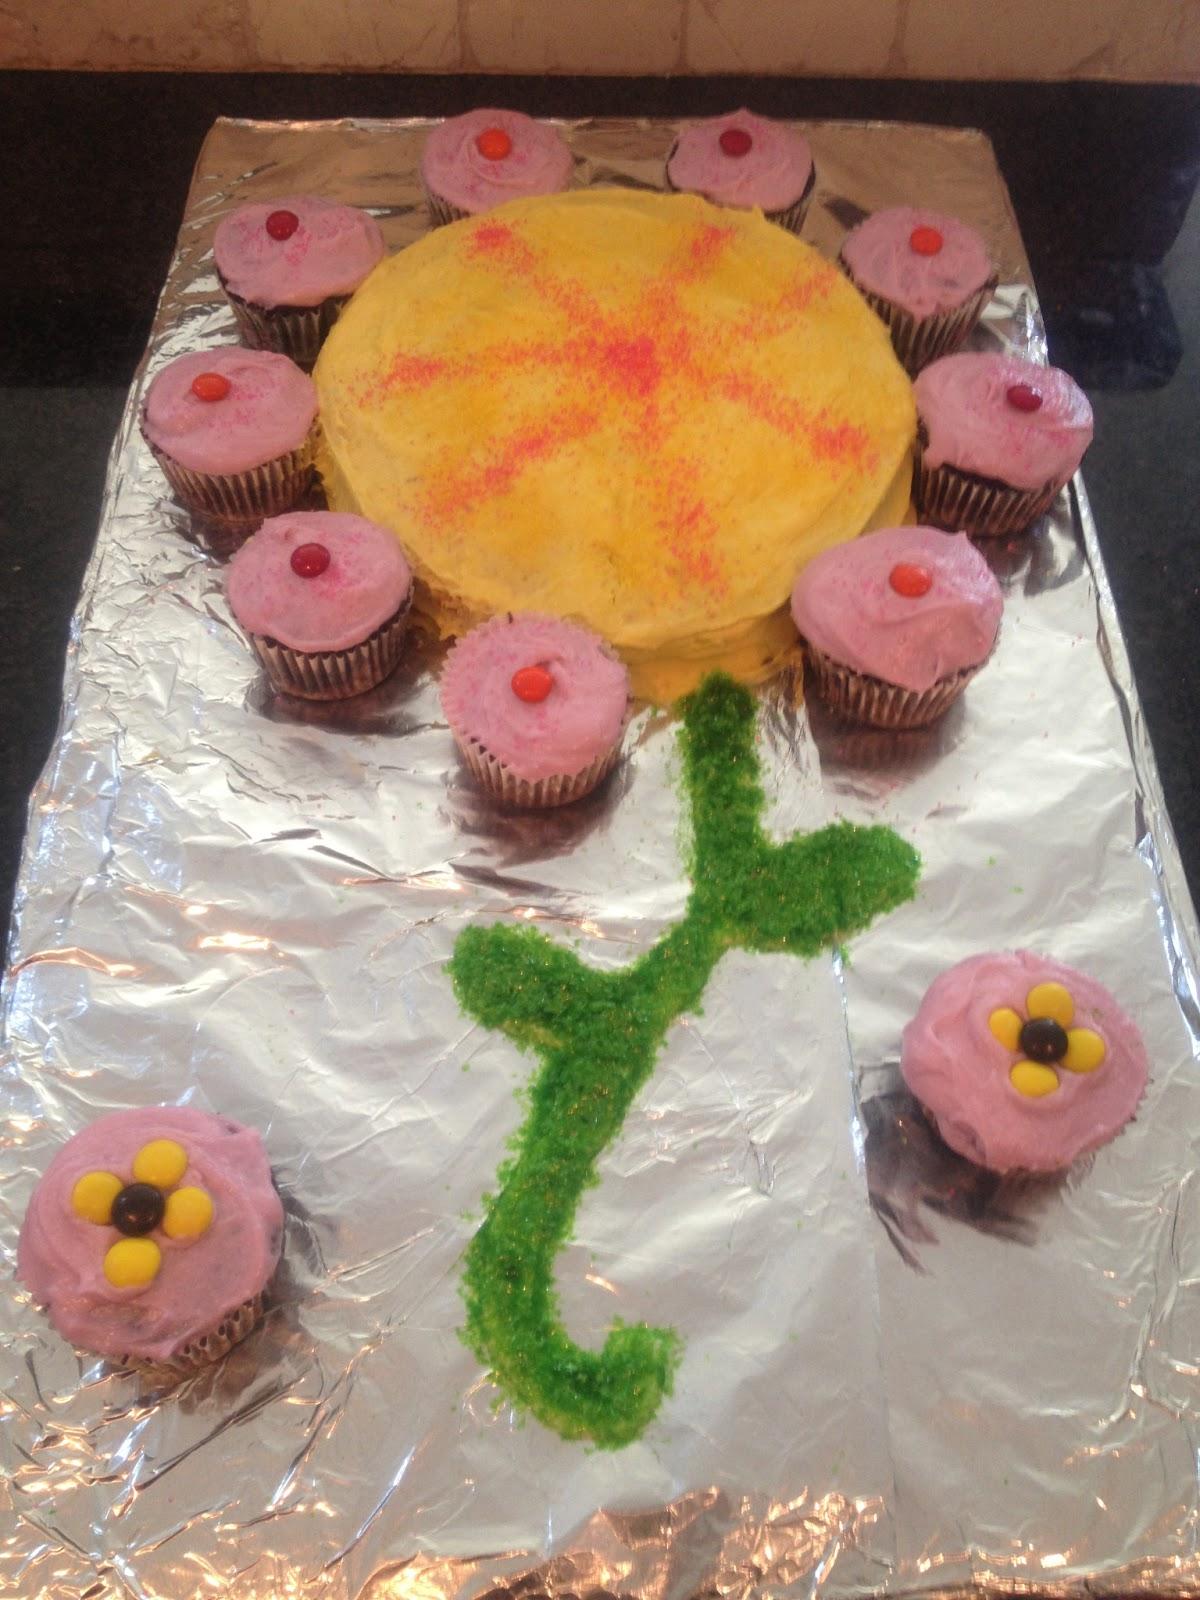 Miniature Golf Cake Decorating Ideas